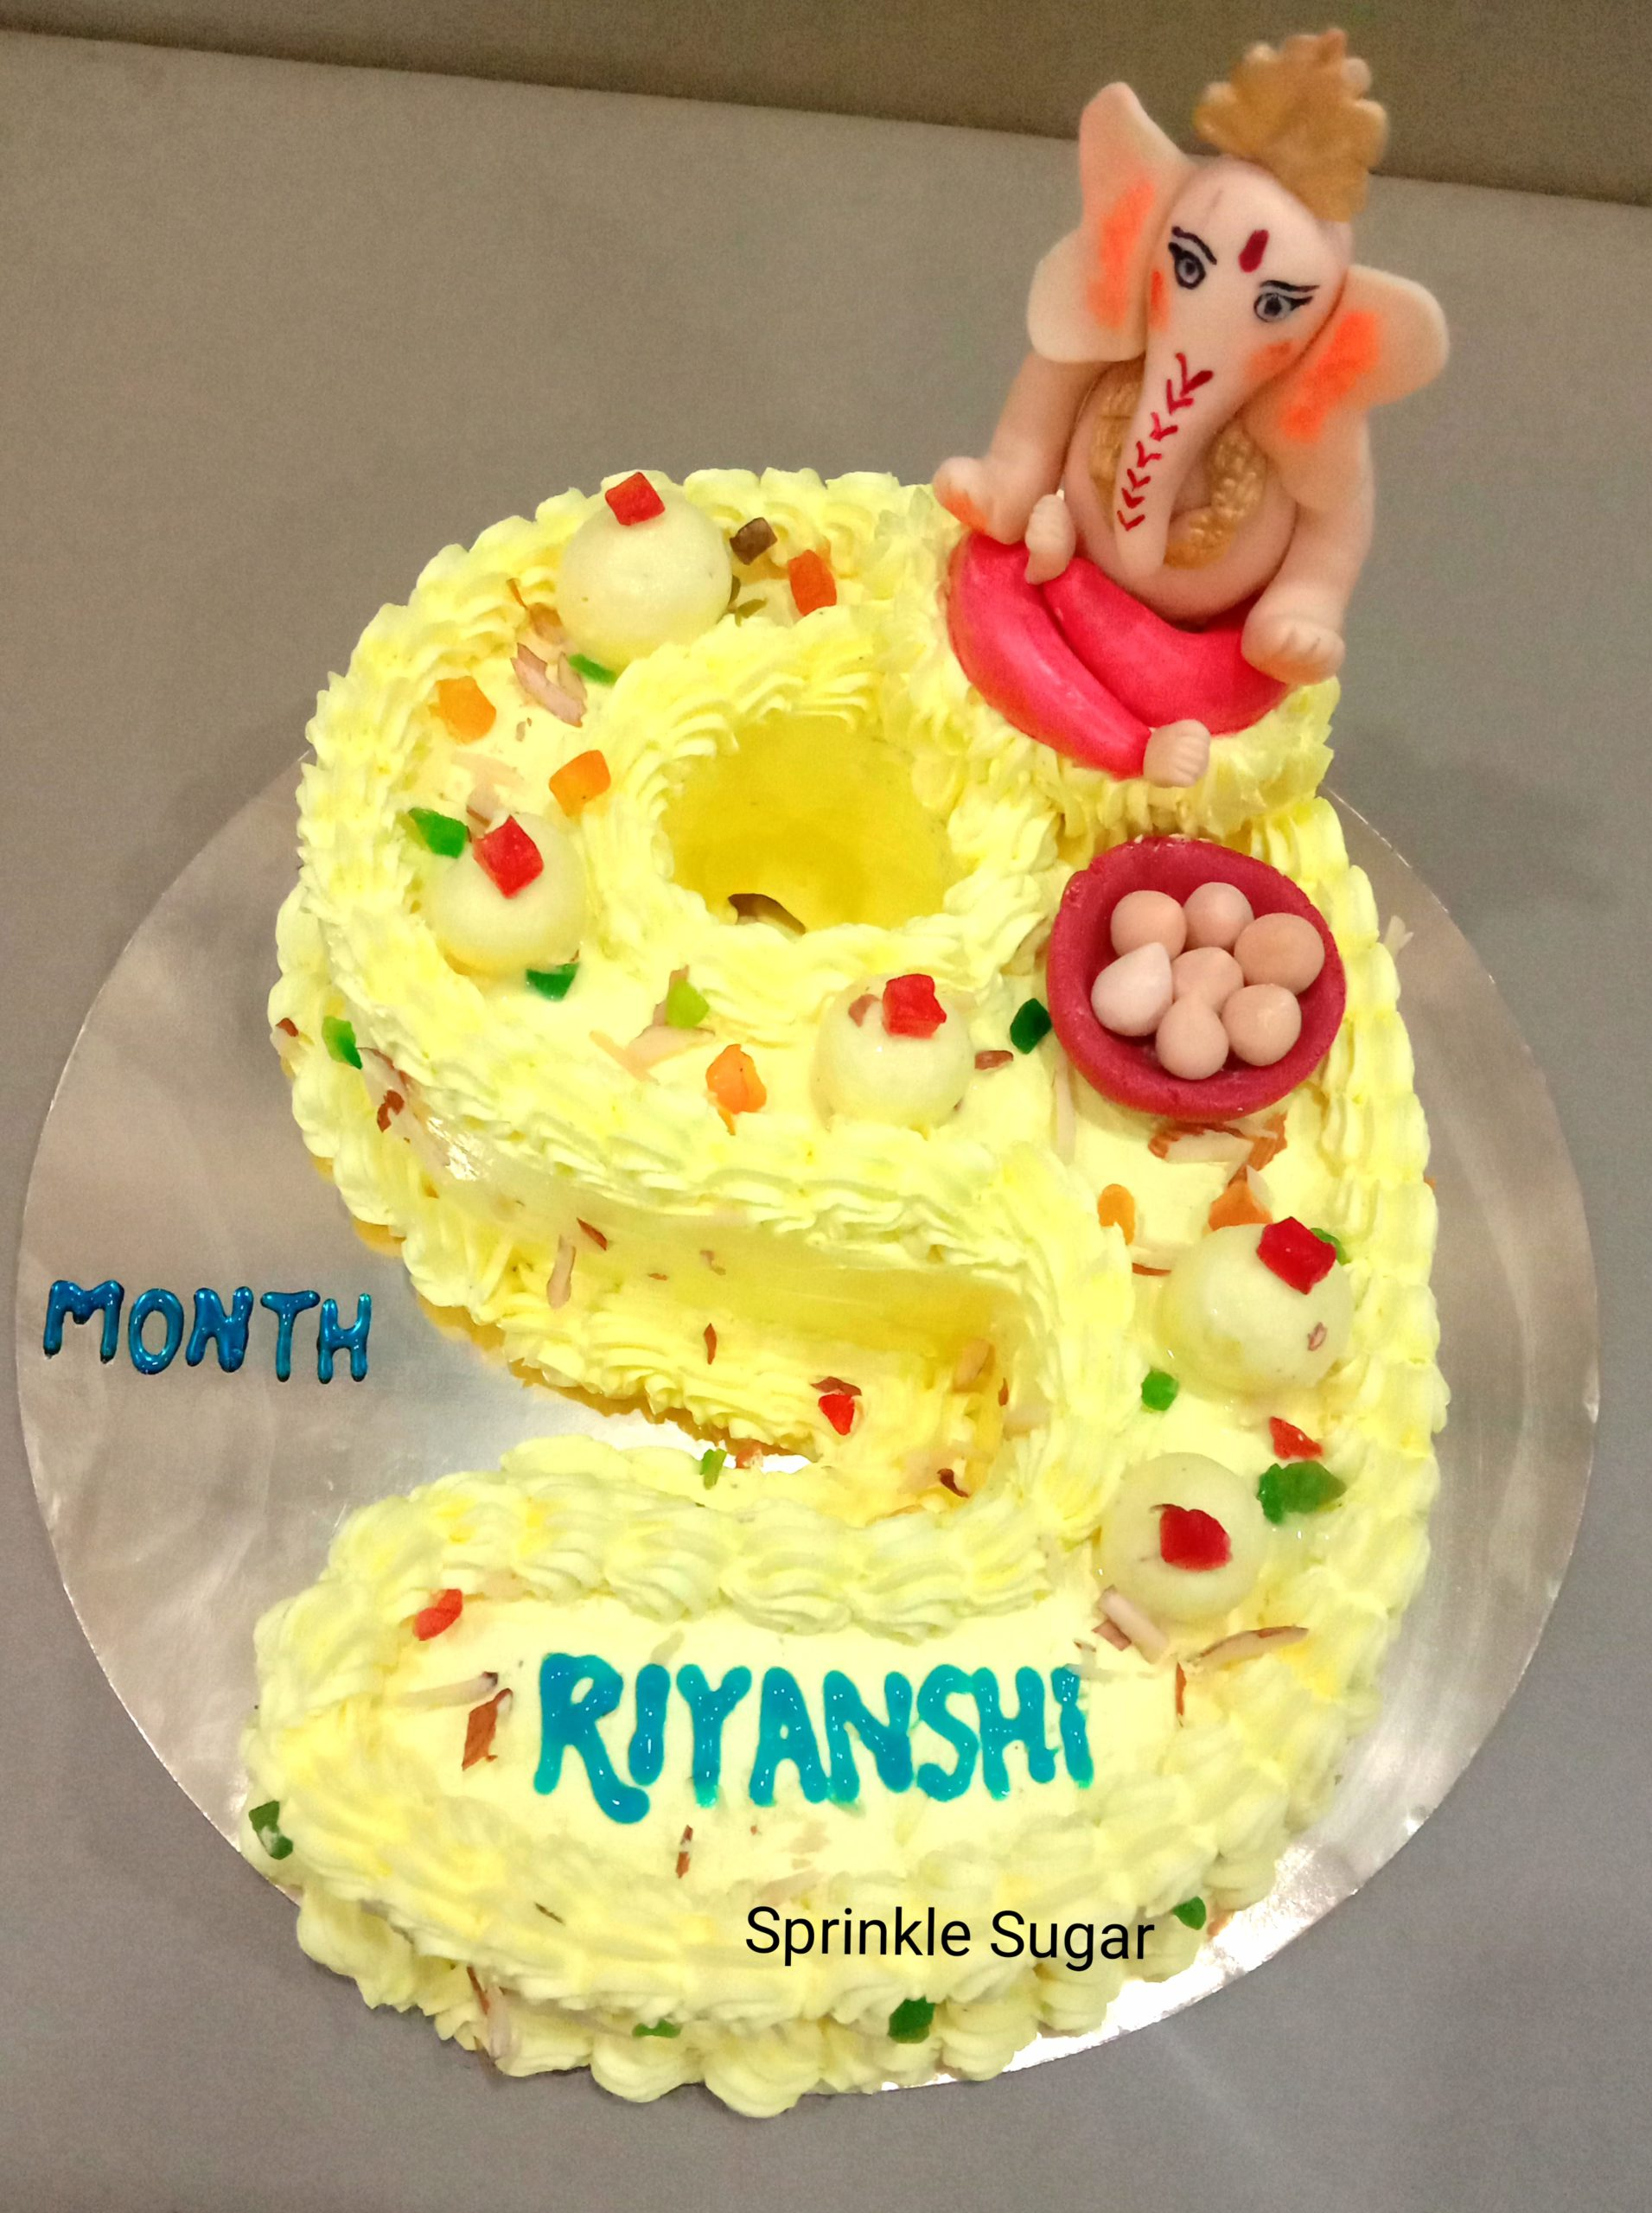 Ganpati Number Theme Cake Designs, Images, Price Near Me